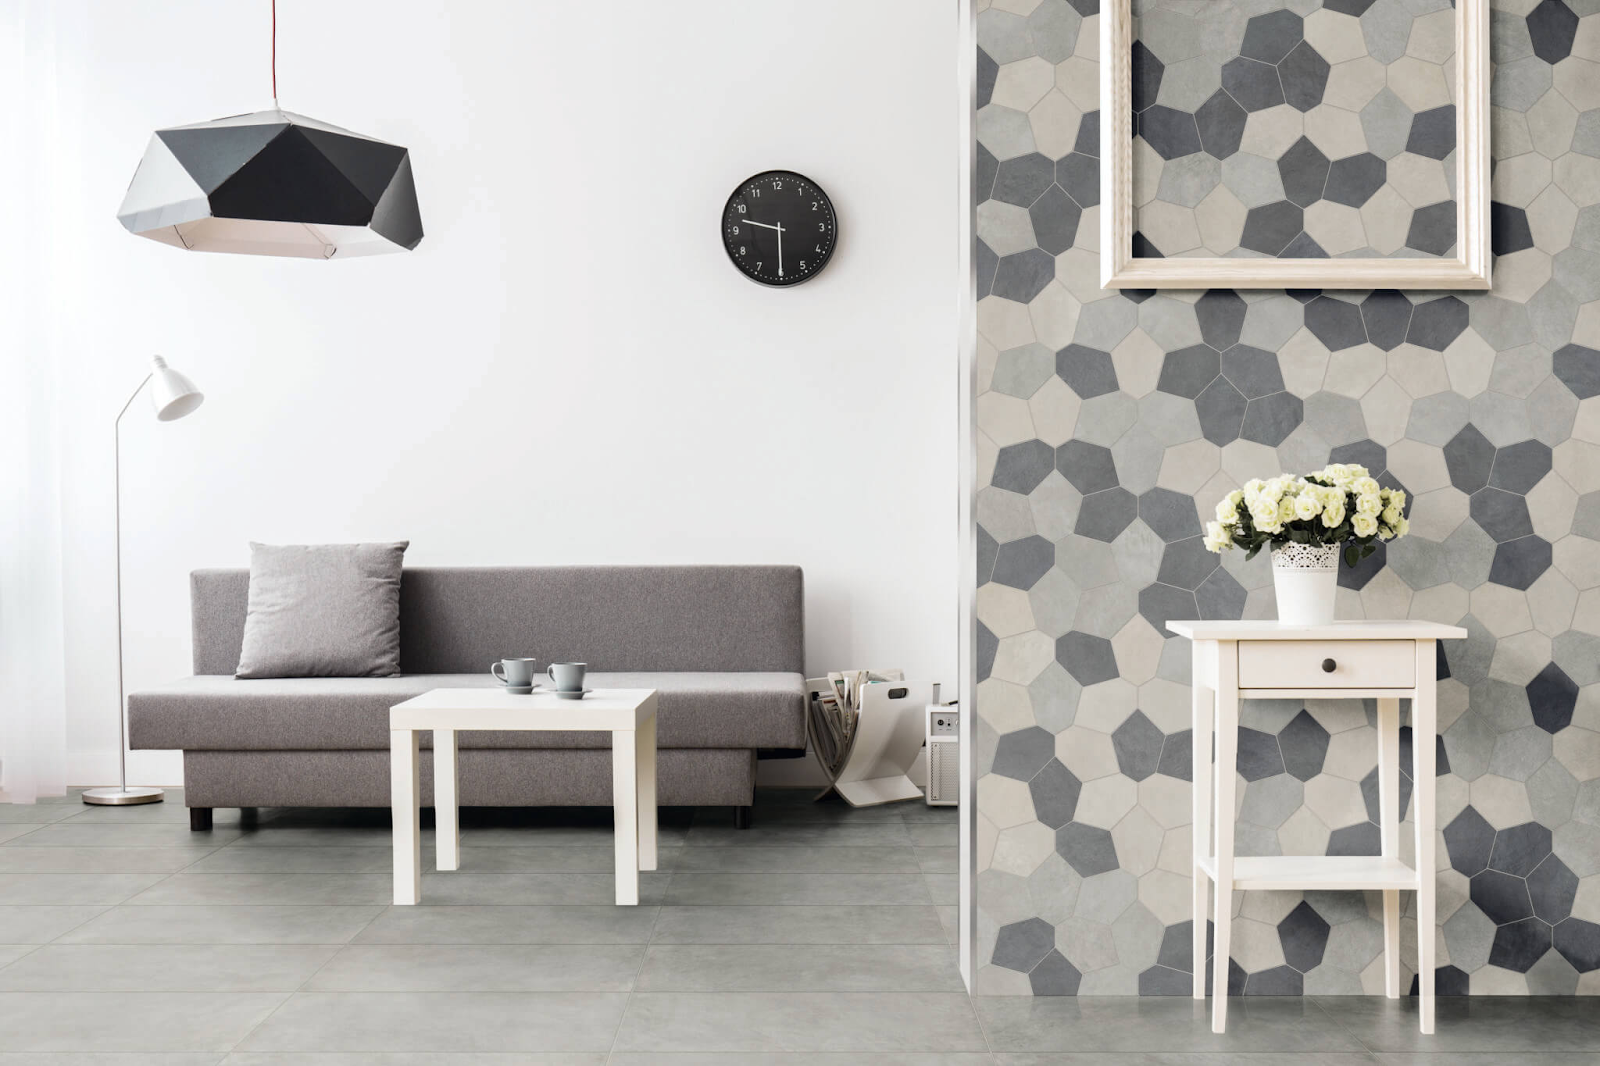 Distorted concrete-look hexagon tile wall